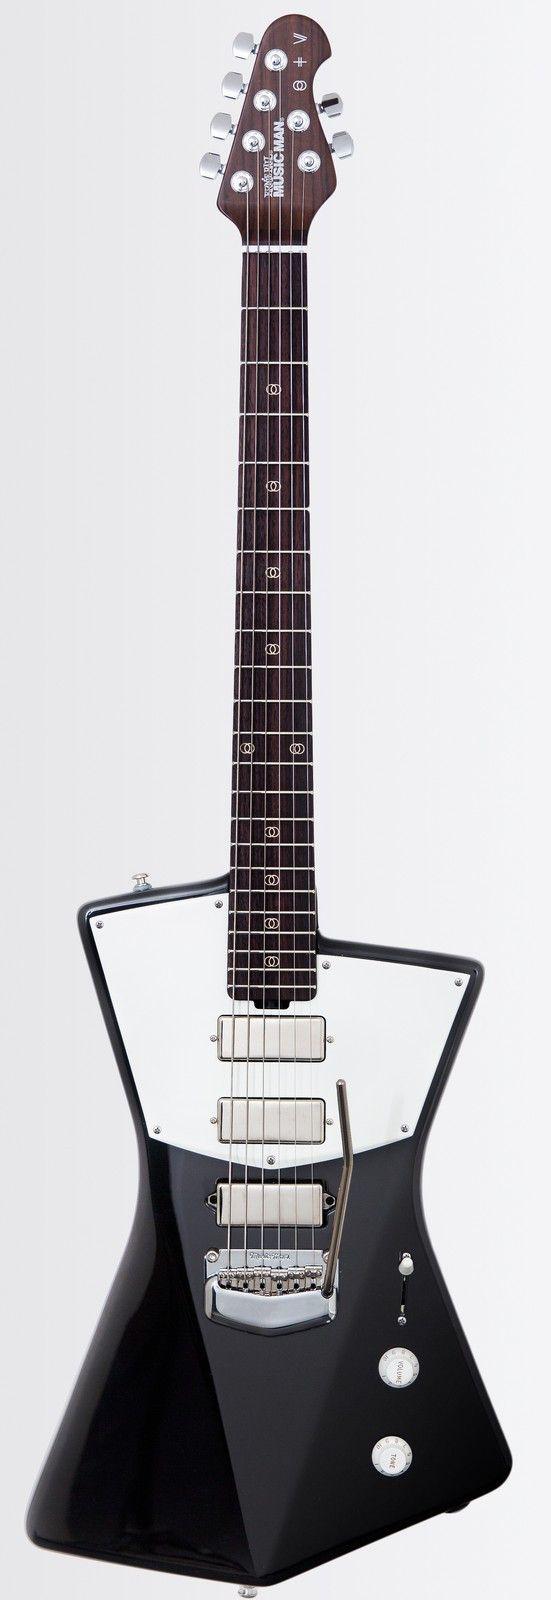 Ernie Ball Music Man St. Vincent Signature Guitar